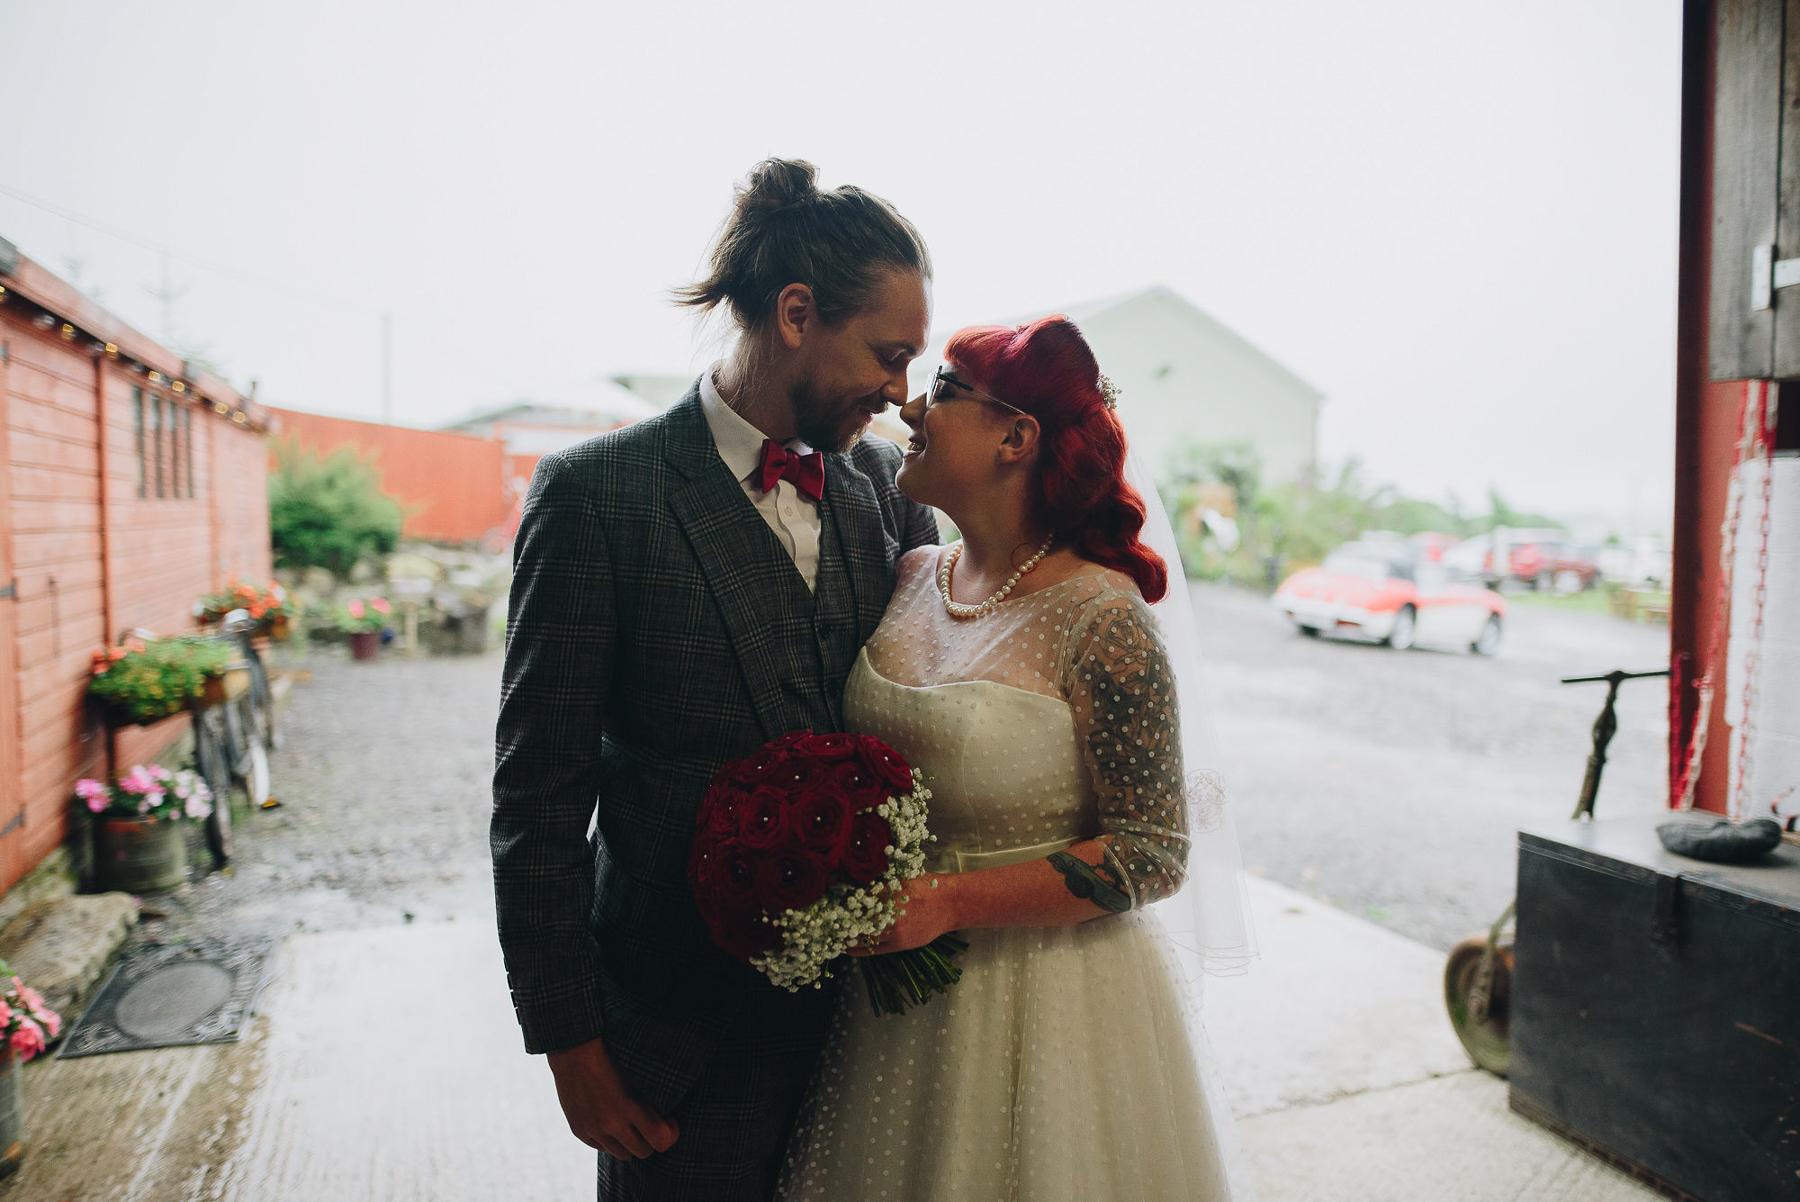 Wellbeing_Farm_Wedding_Photography_The_Pin-Up_Bride_Lara_Shaun-90.jpg